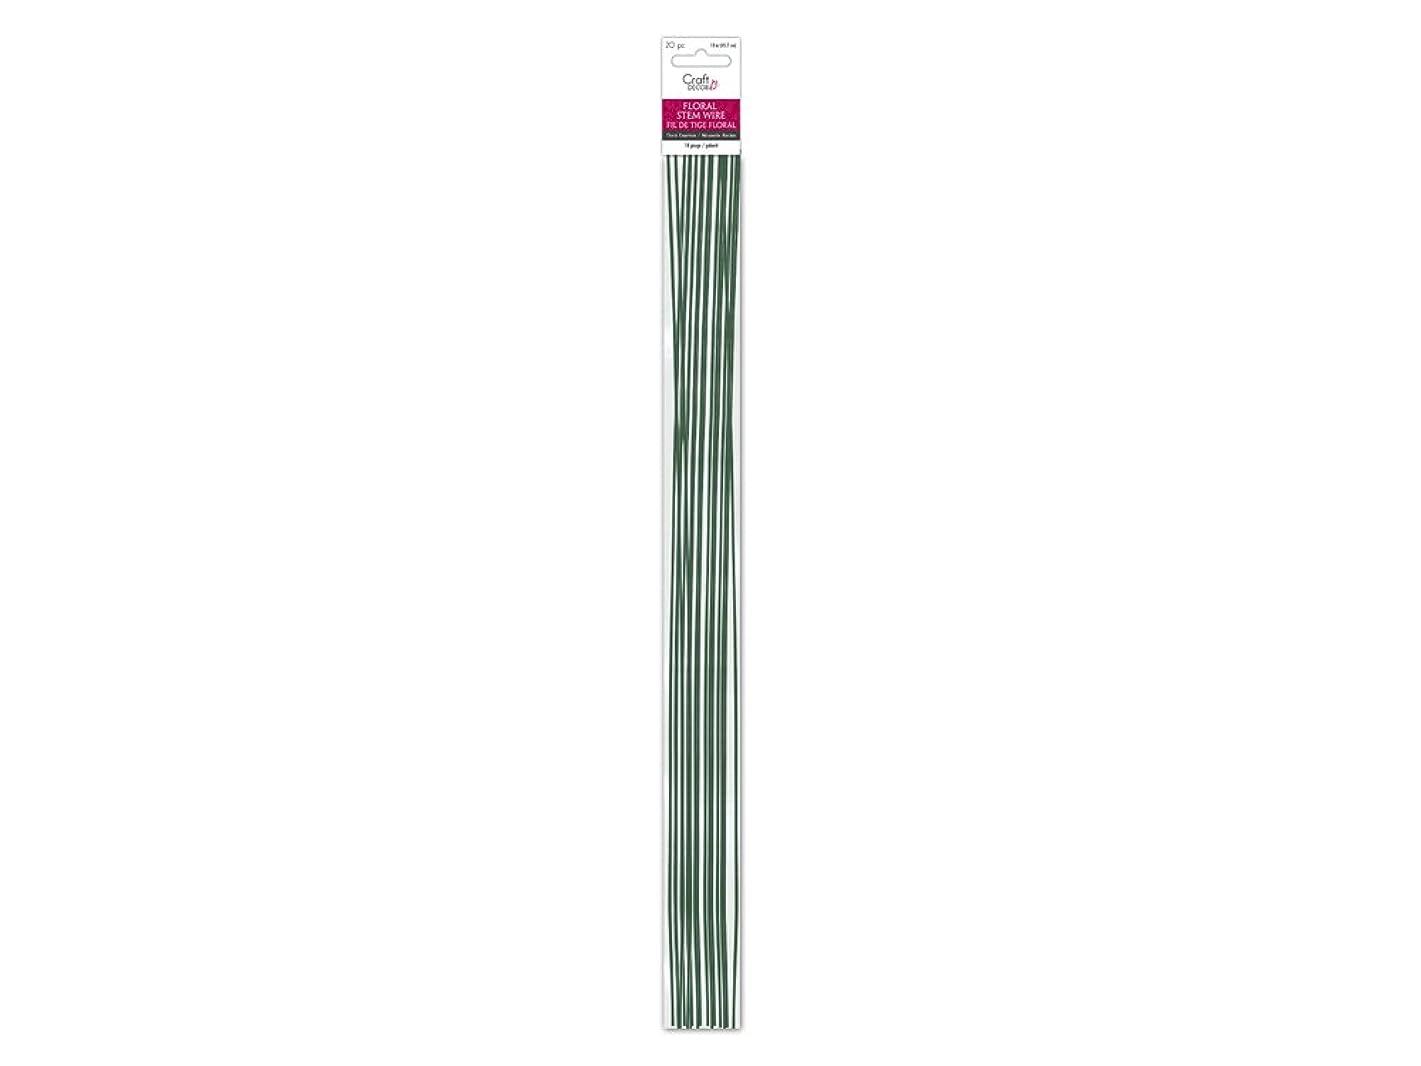 Craft Décor FL019 Floral Stem Wire 18g Green 18in, 20/pk